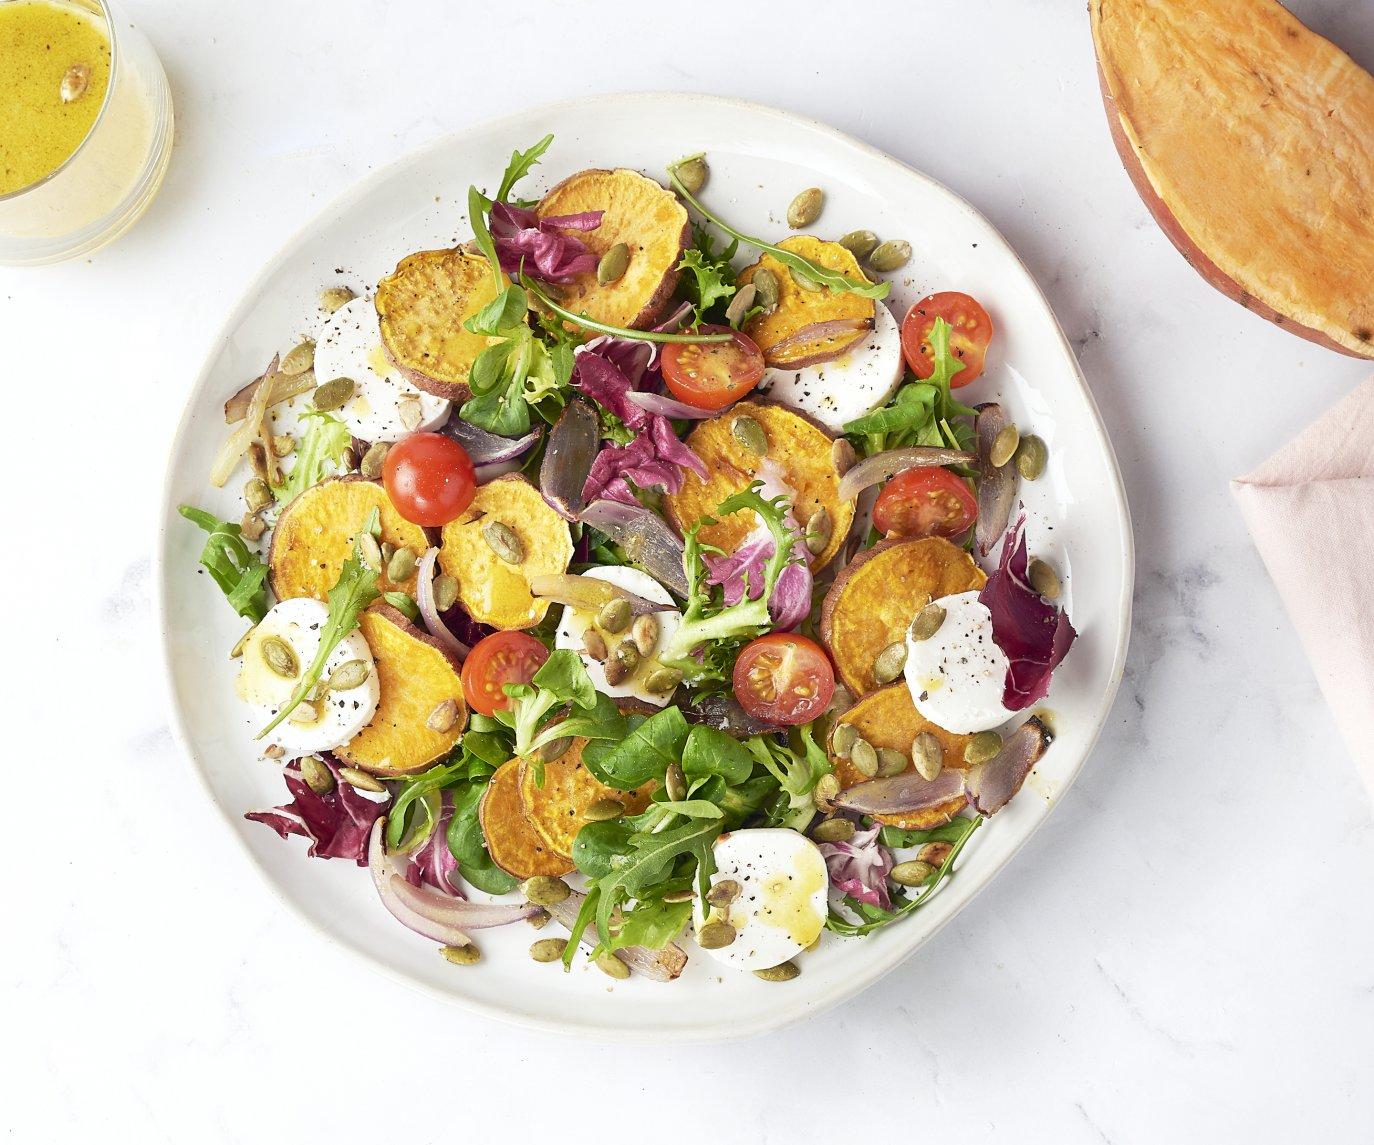 Geroosterde zoete aardappelsalade met geitenkaas en honing-mosterddressing